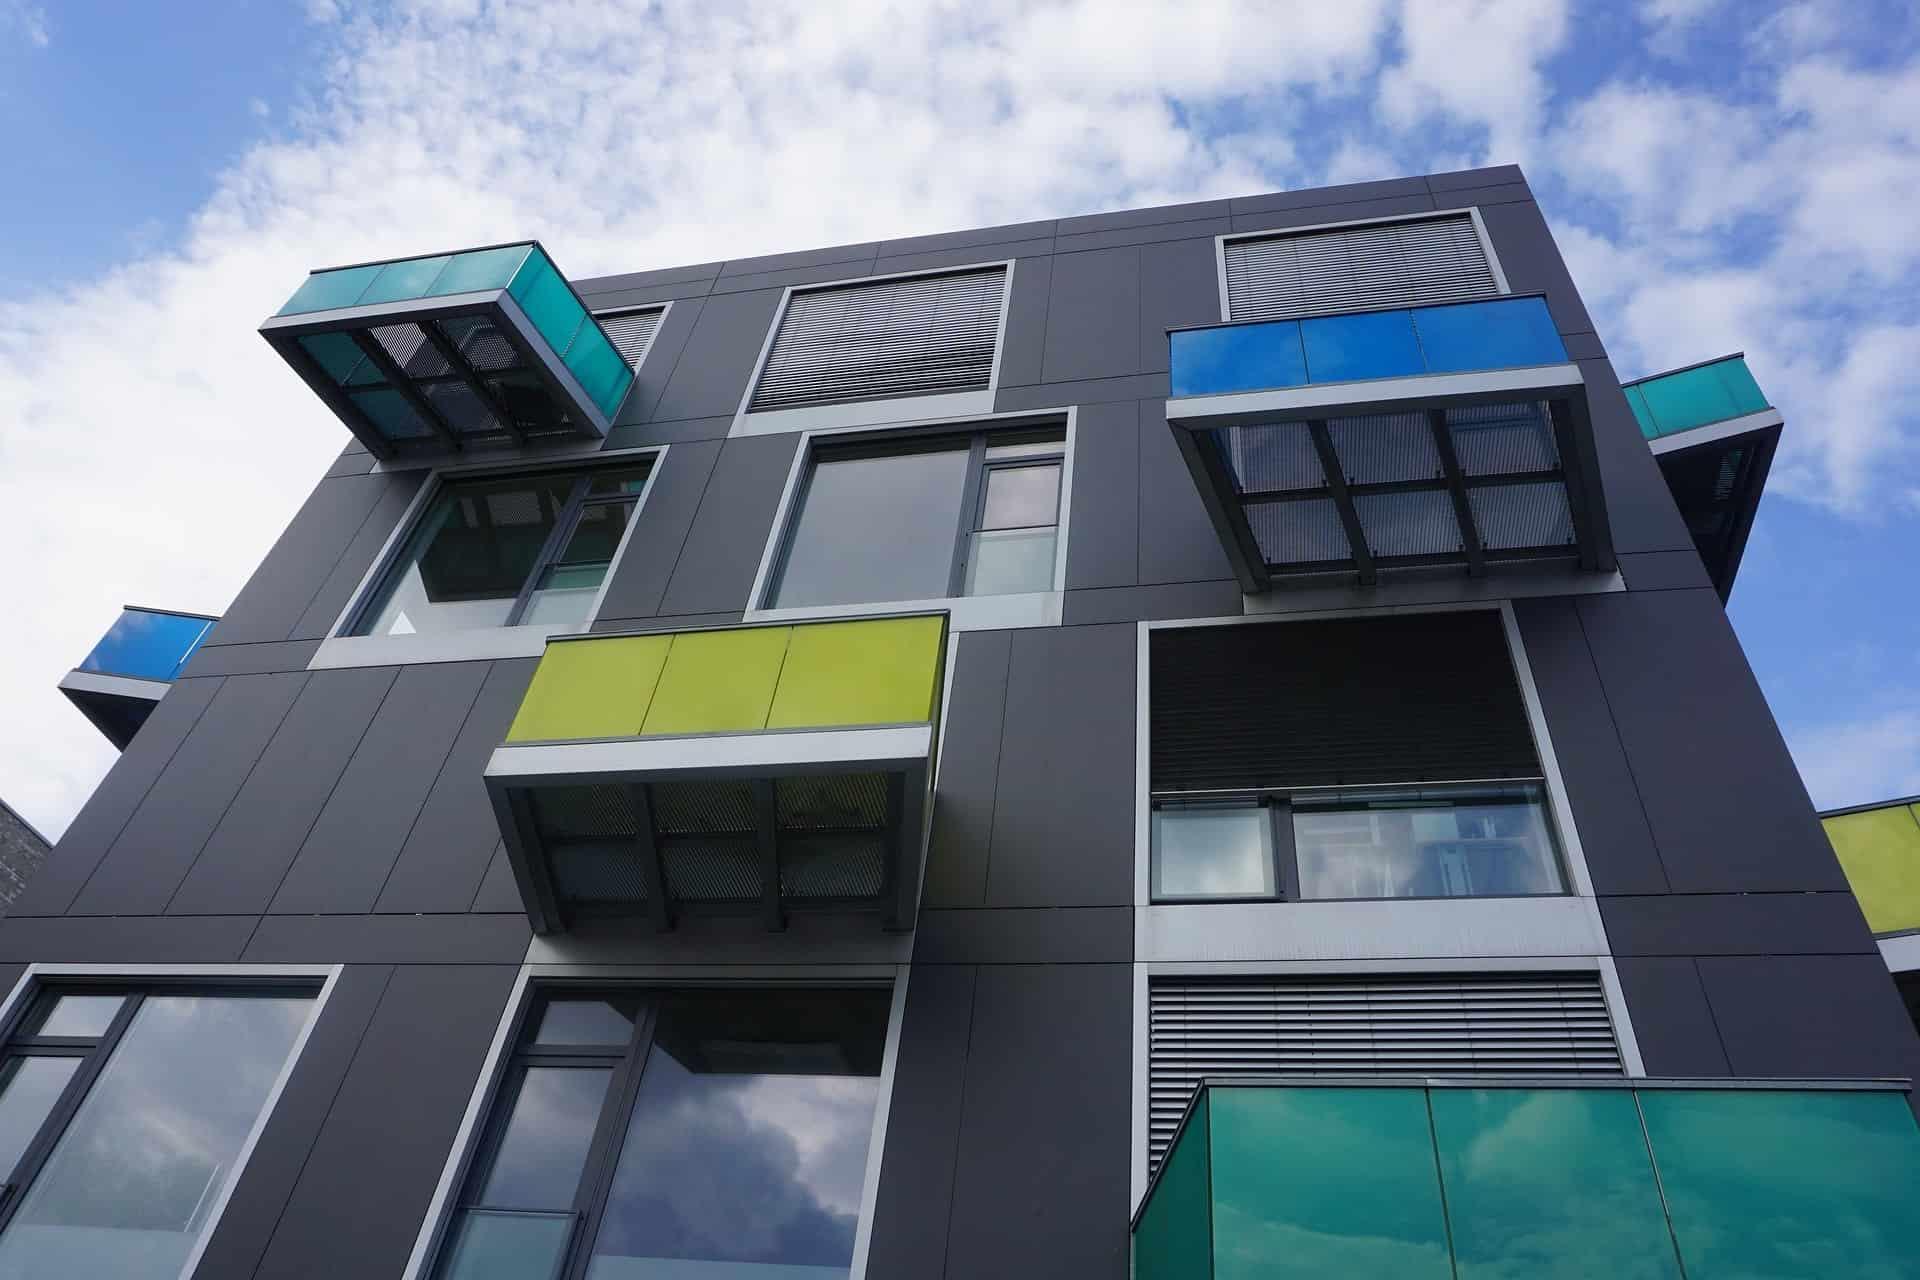 Wohnblock mit Balkon